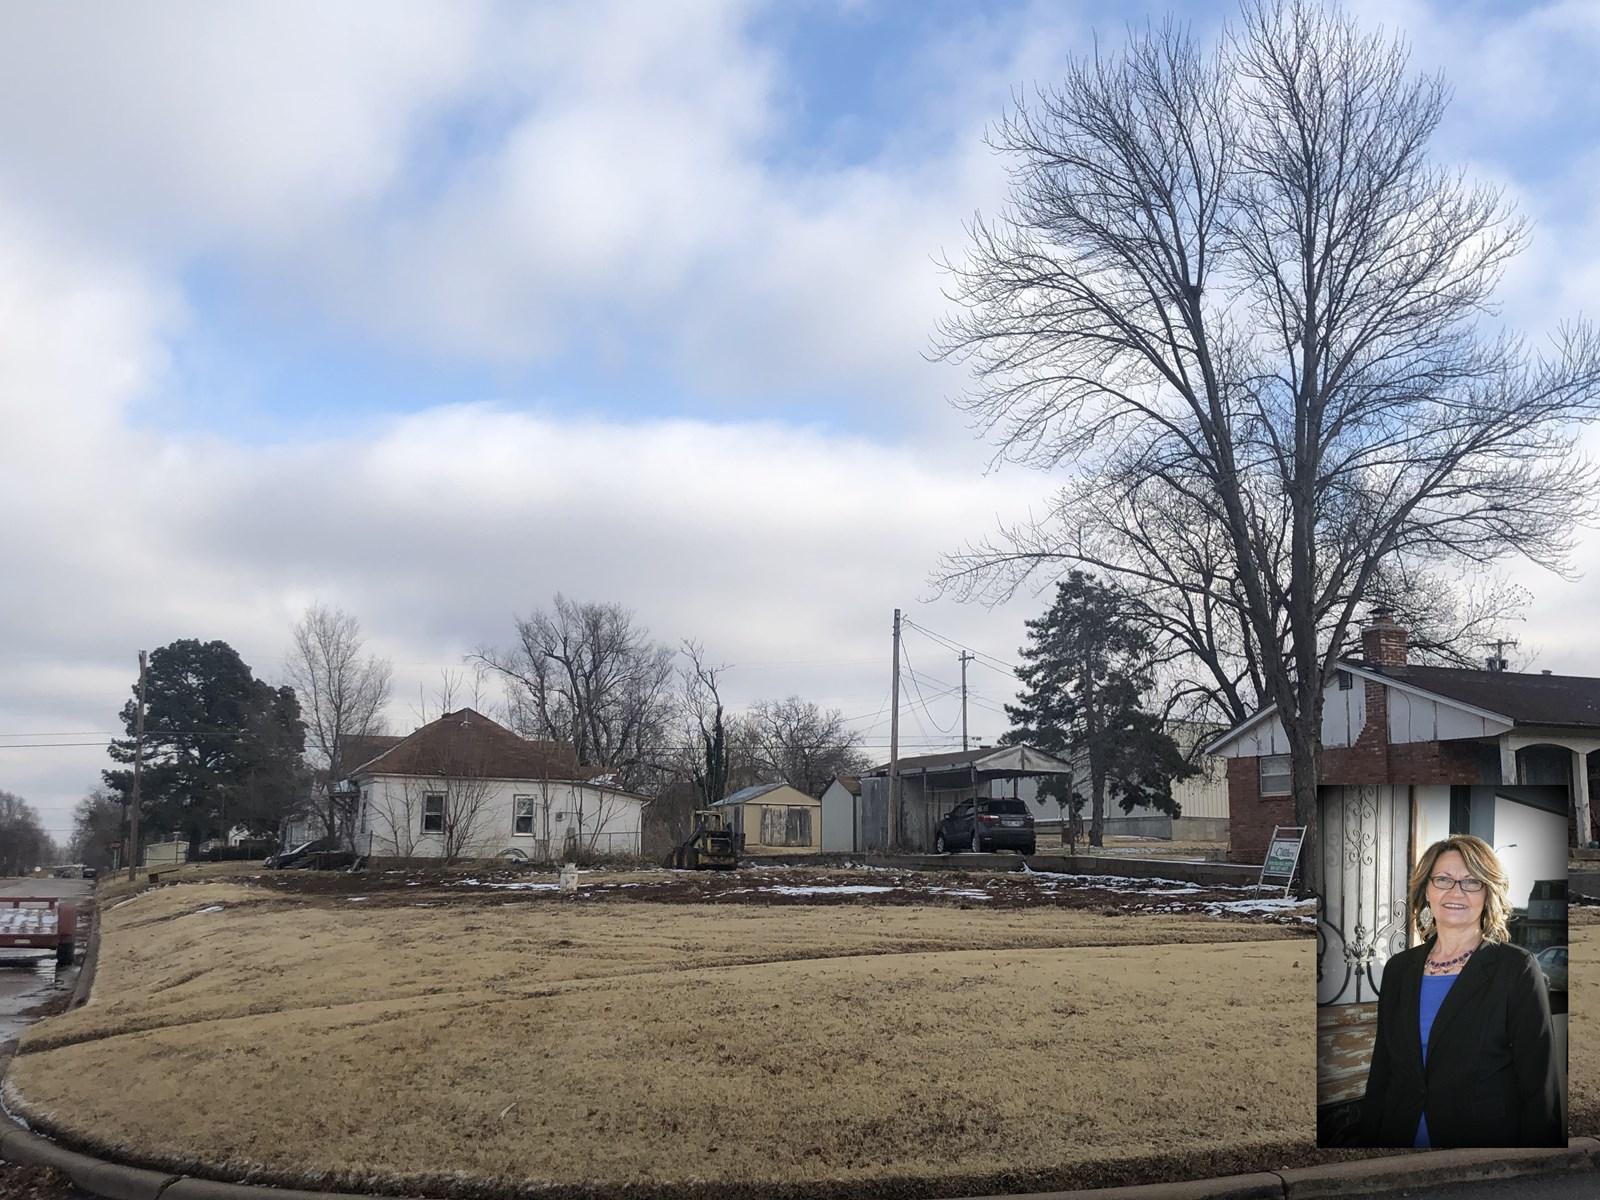 Lot for Sale Alva, OK  (Woods County)